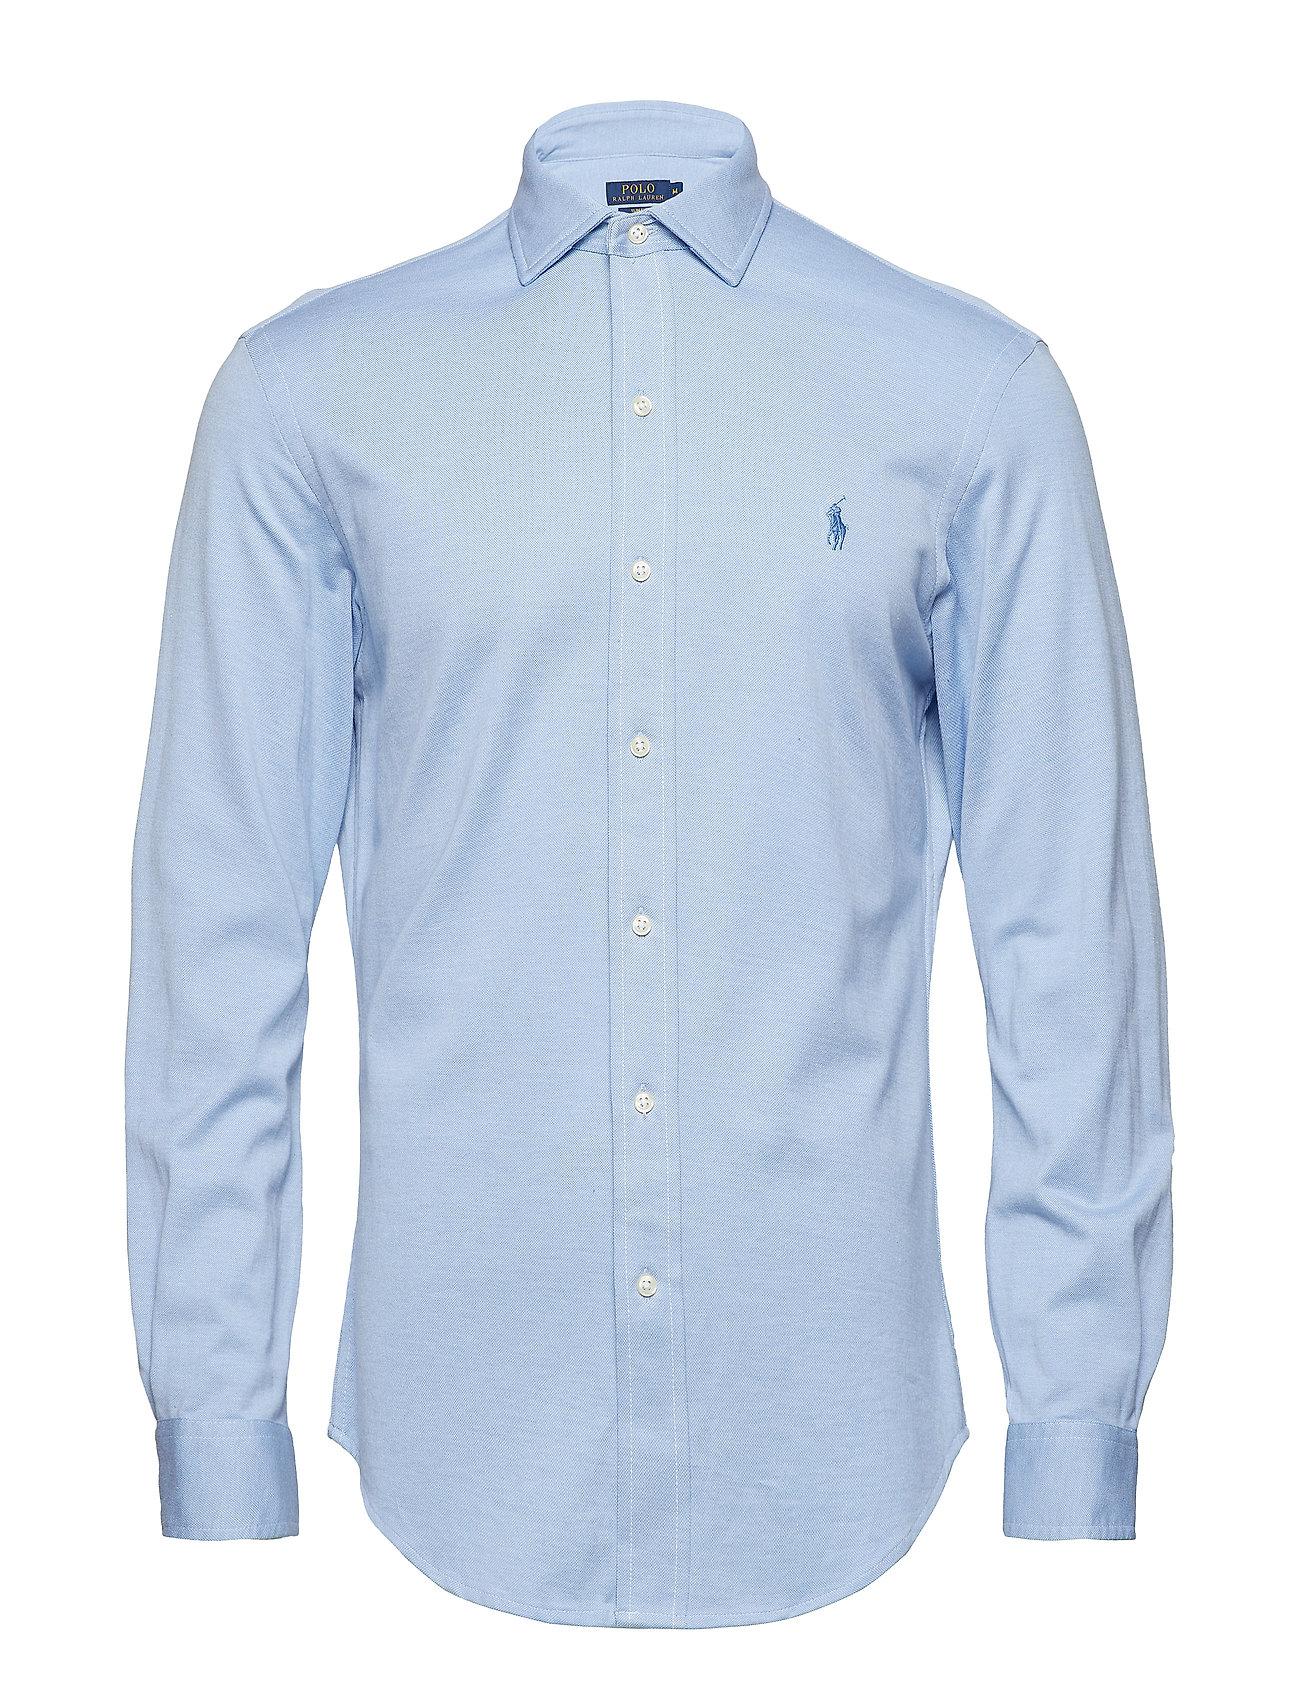 154c75f5729f14 Classic Fit Knit Oxford Shirt (Harbor Island Blu) (£100) - Polo ...